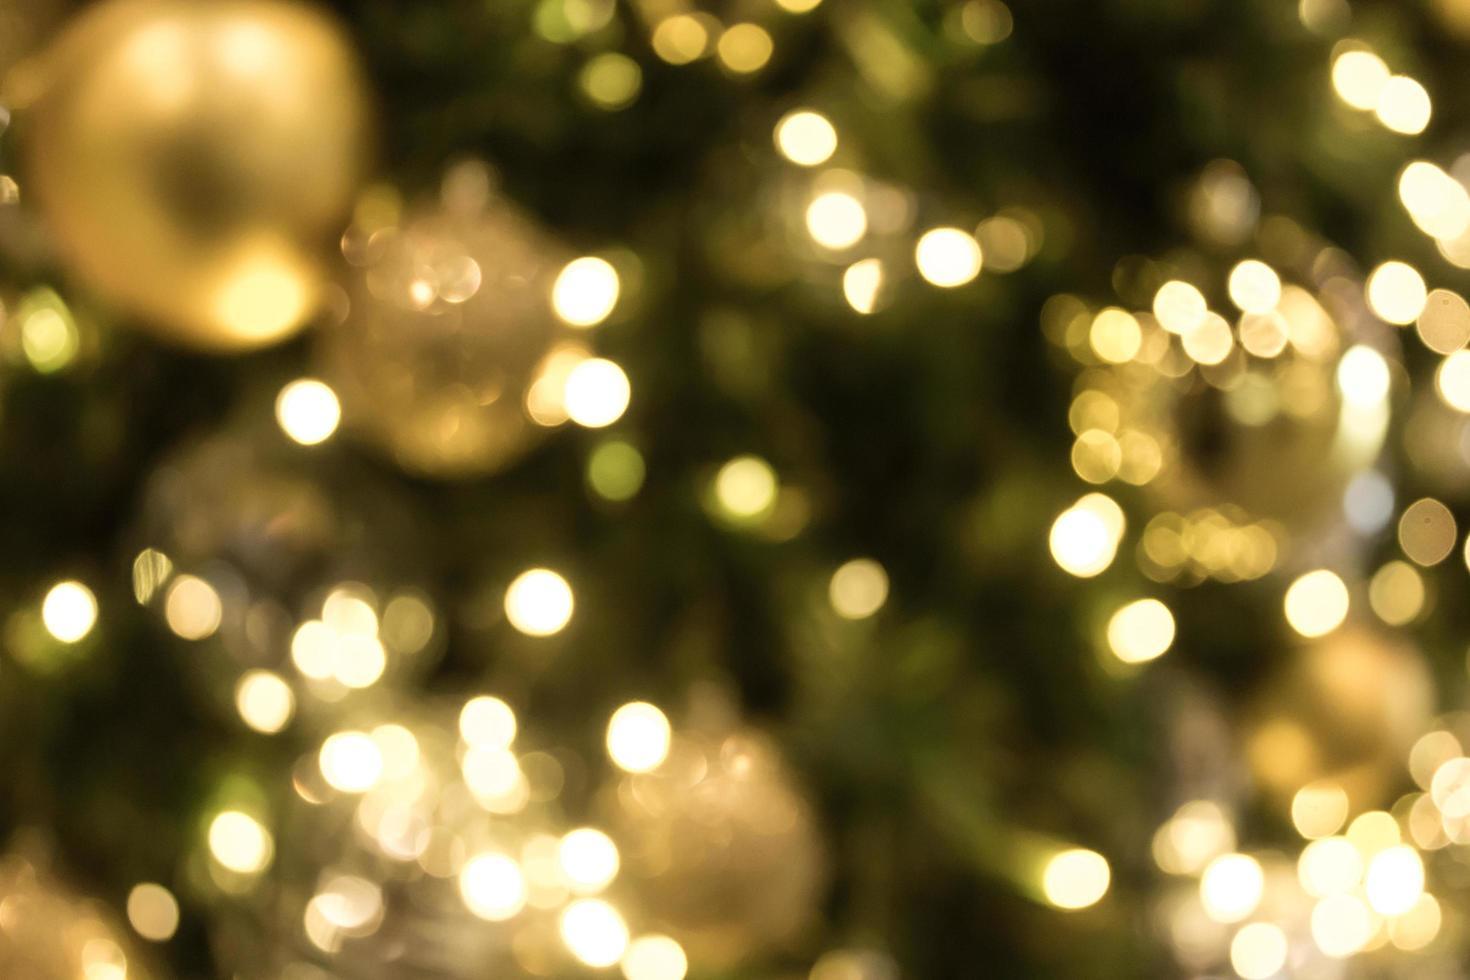 natal com bokeh dourado de fundo claro foto